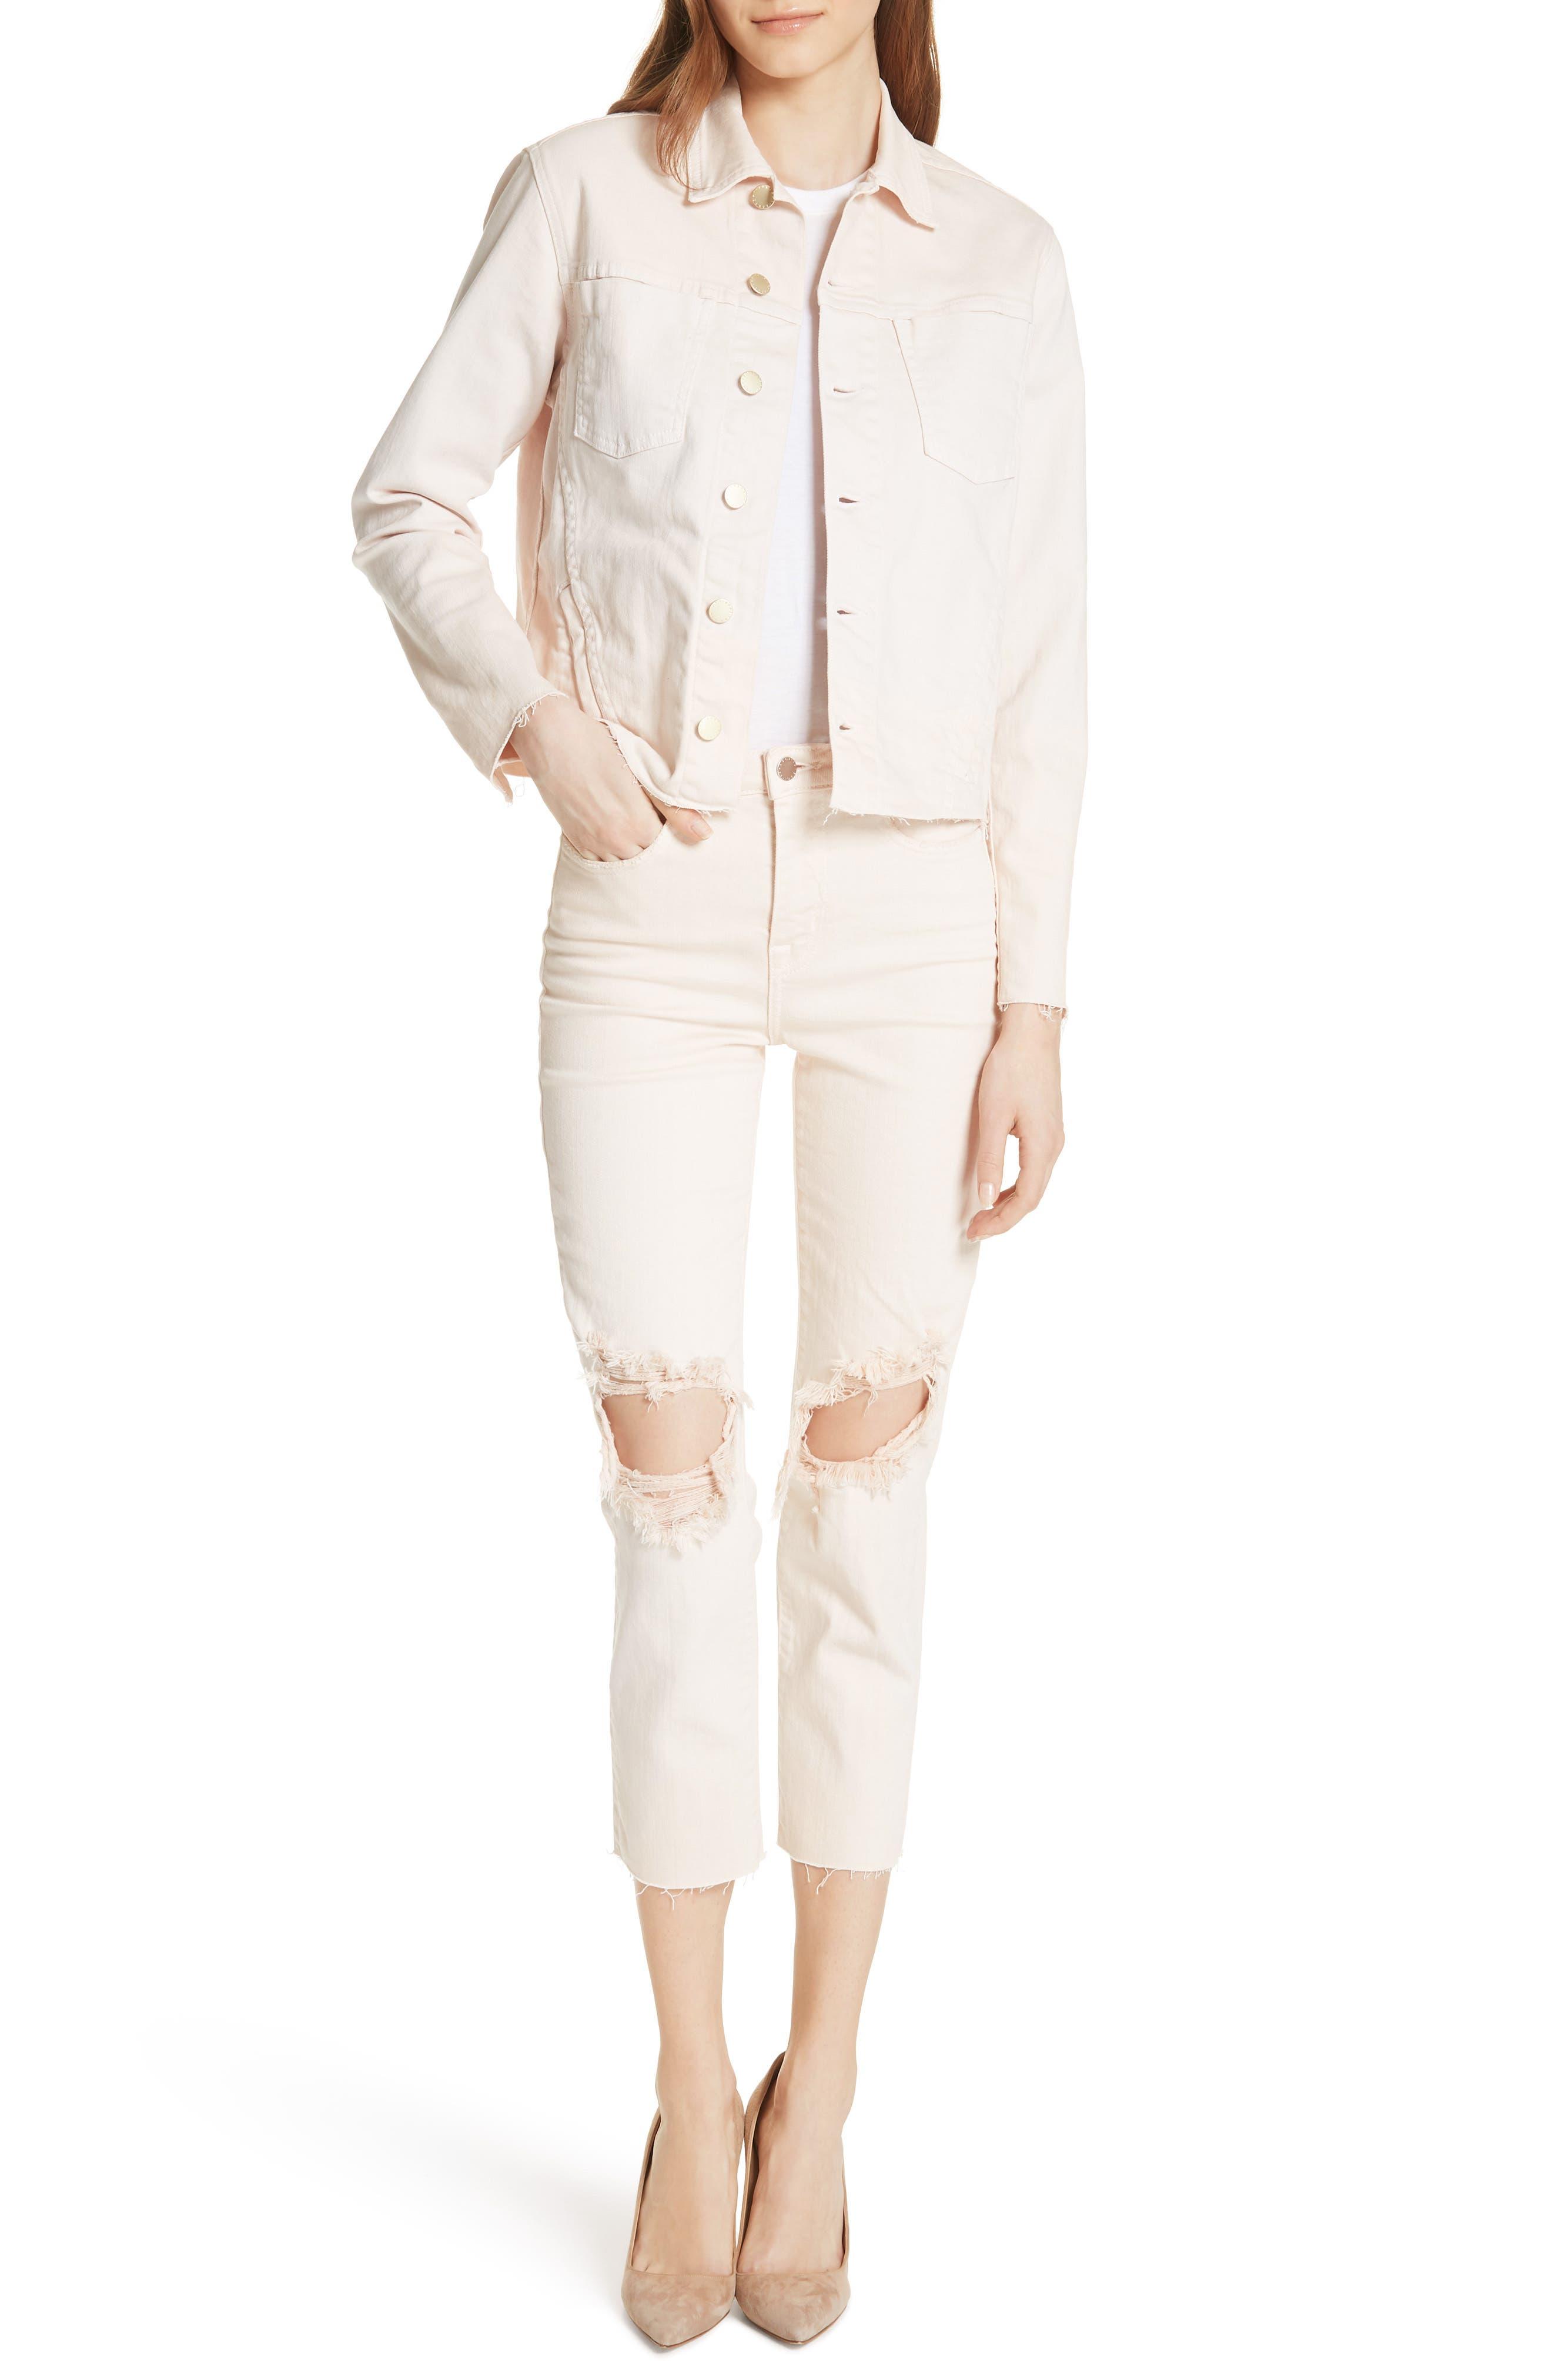 Audrina Ripped Straight Leg Crop Jeans,                             Alternate thumbnail 7, color,                             Quartz Worn Destruct